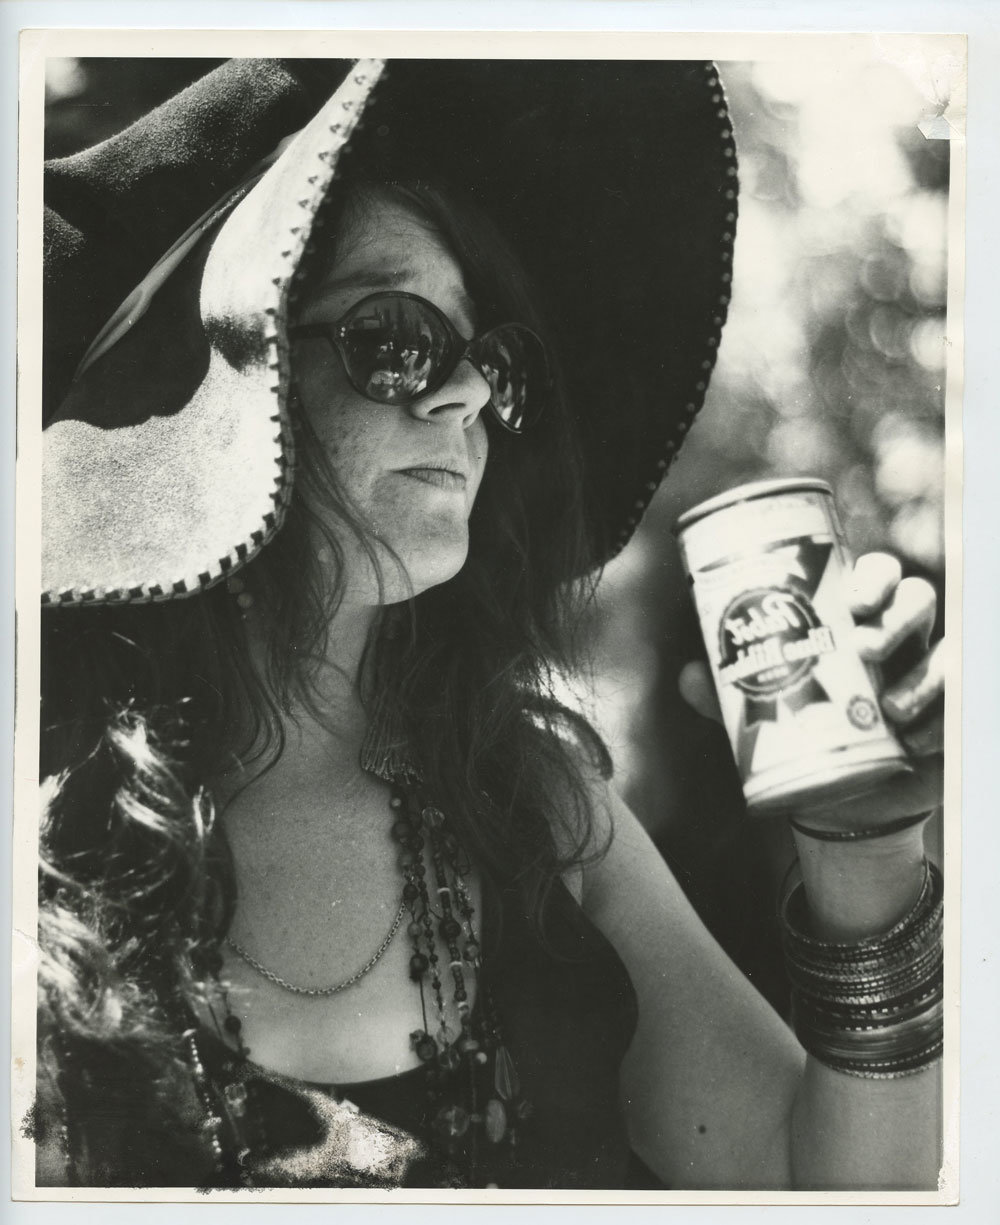 Janis Joplin Photo 1967 Jun 18 Monterey International Pop Music Festival Original